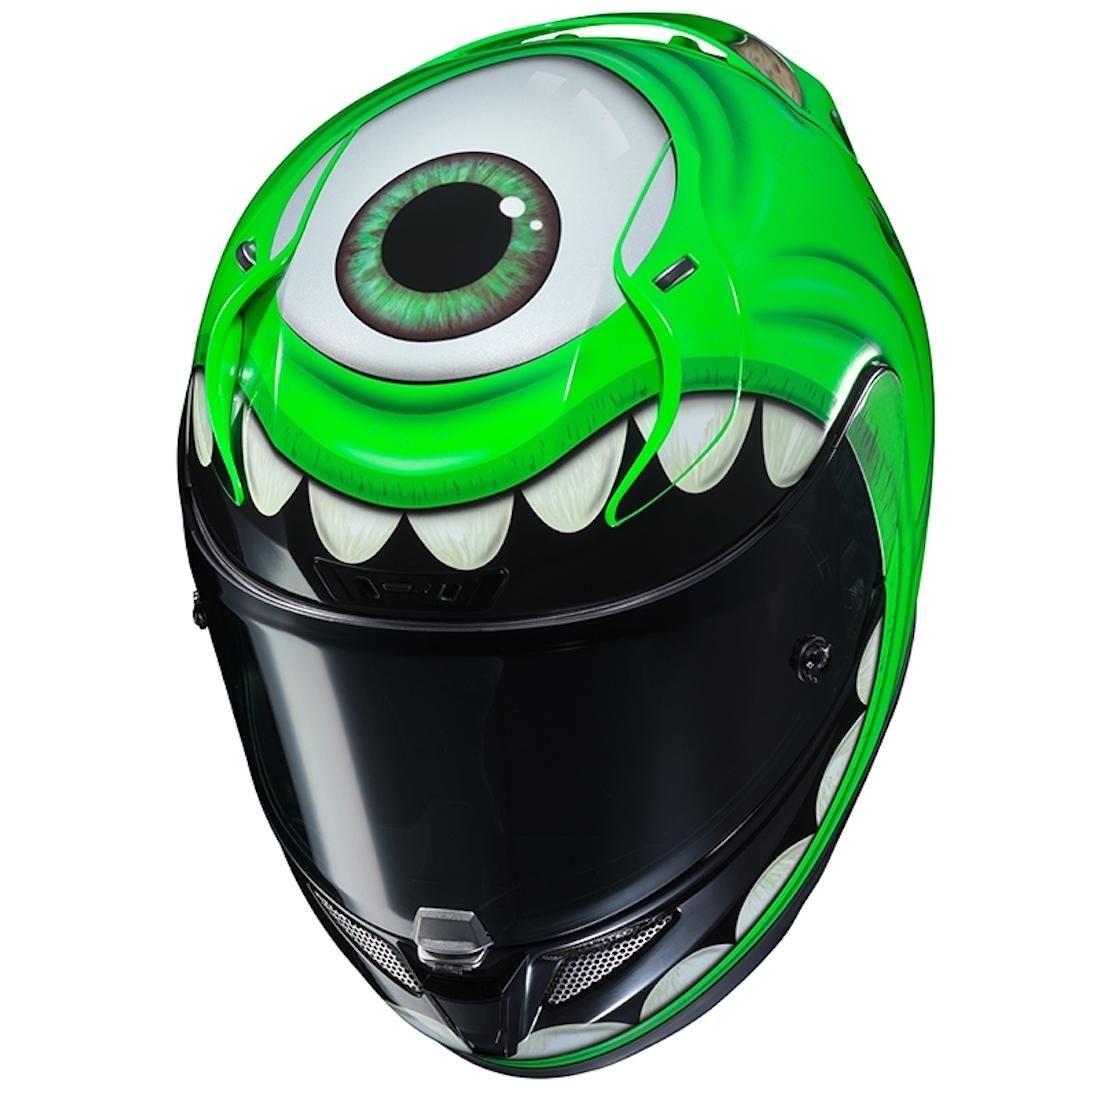 Mike Wazowski Monsters Inc HJC helmet